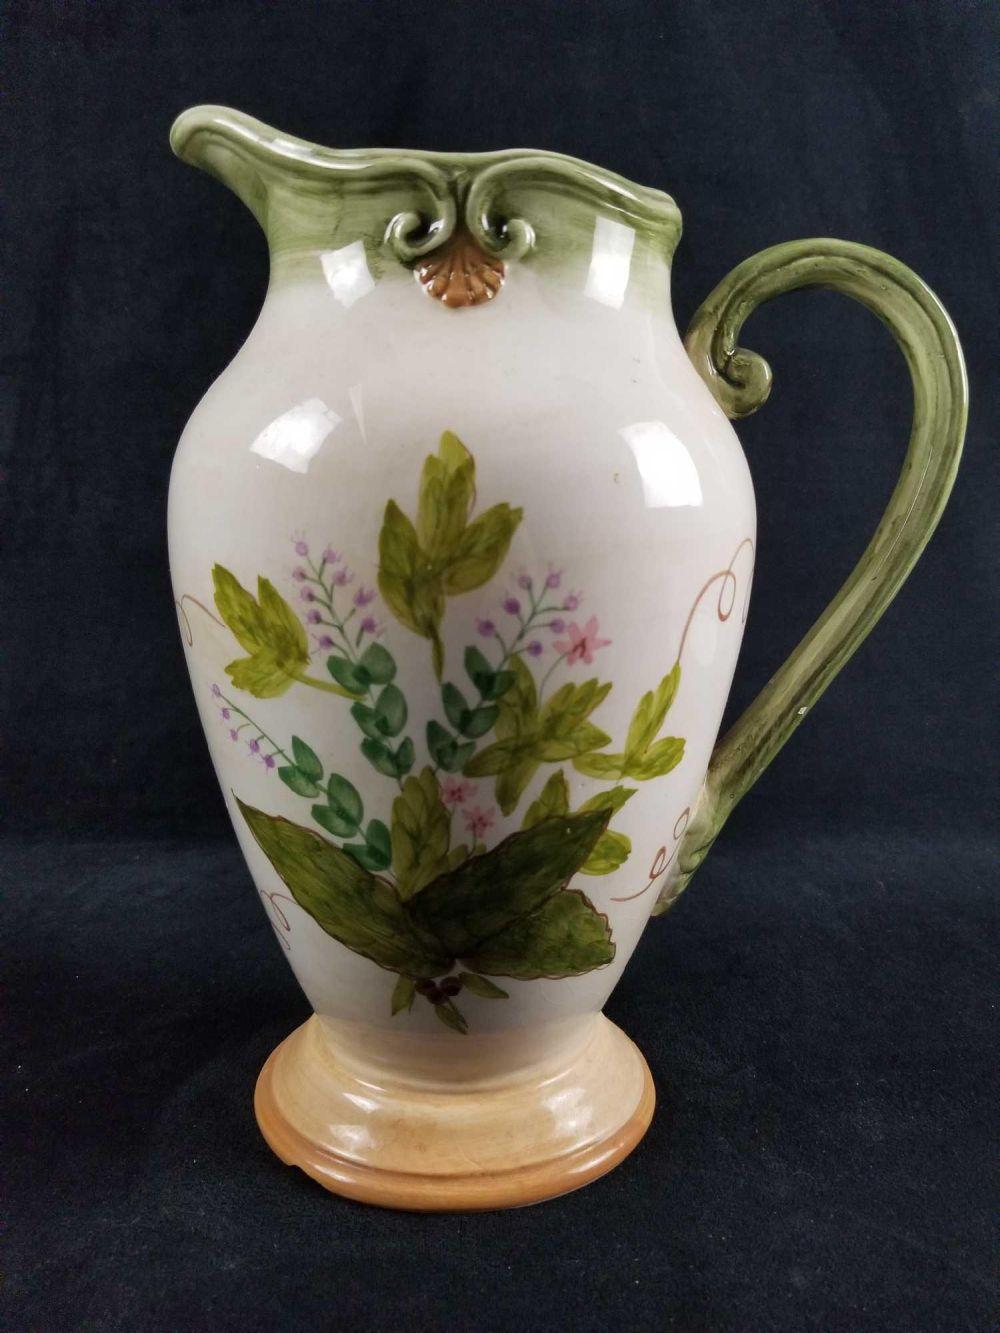 Large Ceramic Pitcher with Floral Design